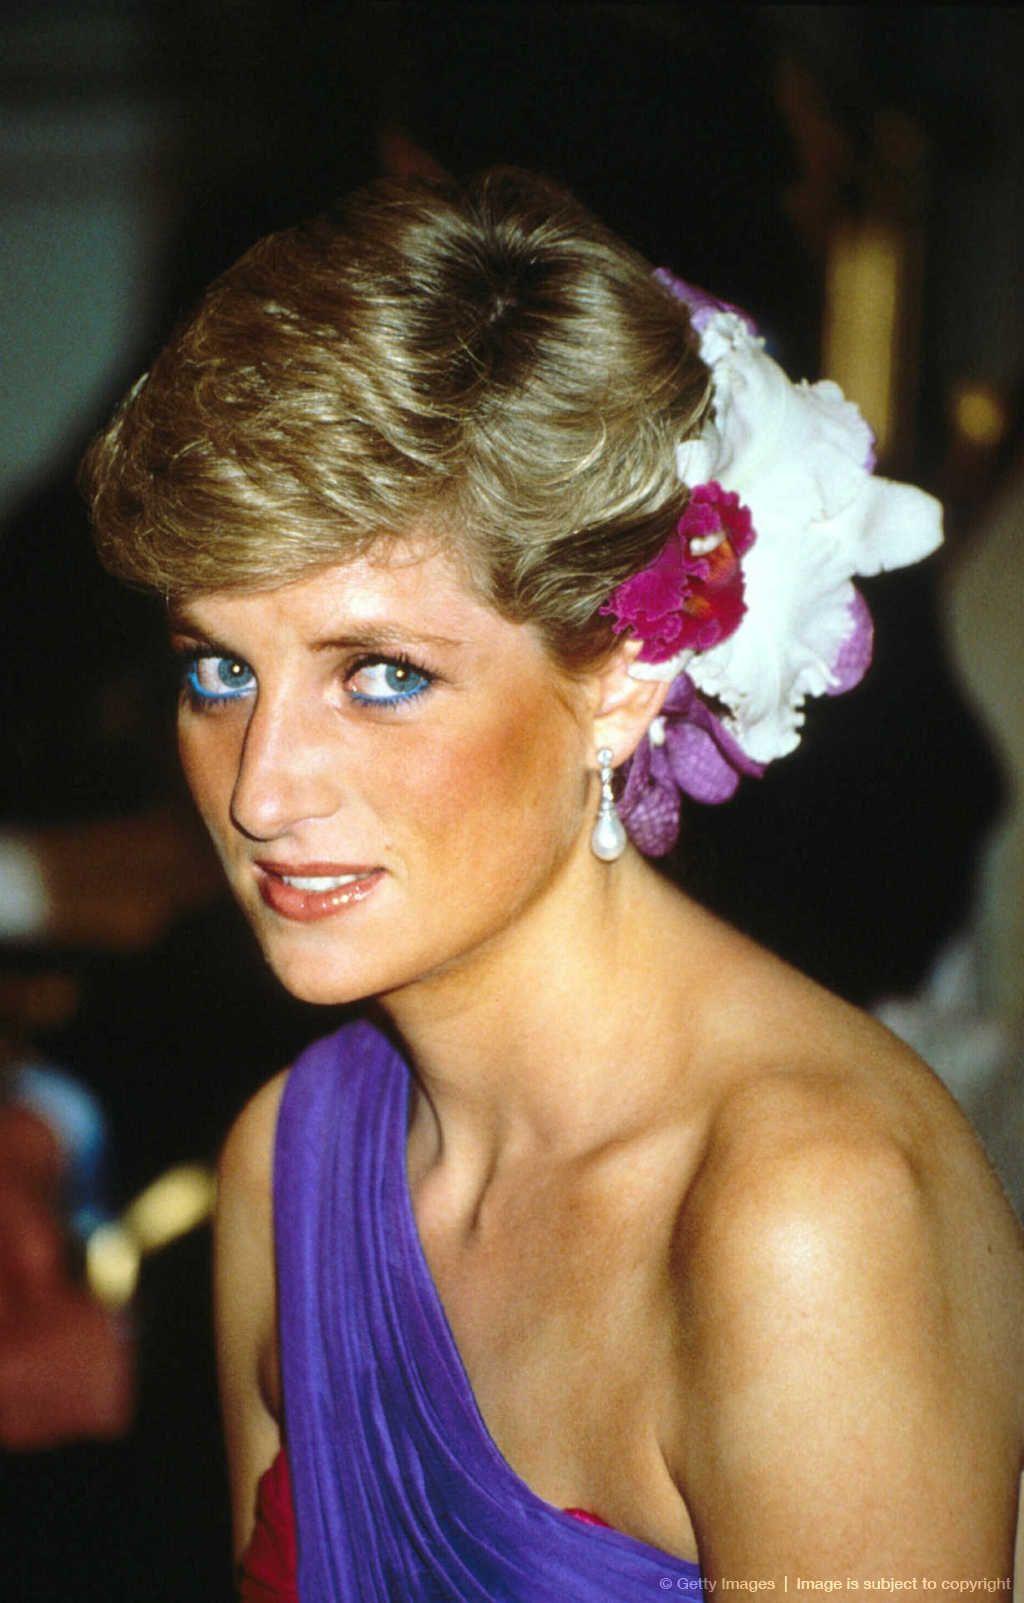 pin by annamaria bianchi on diana e c princess diana family princess diana princes diana pinterest